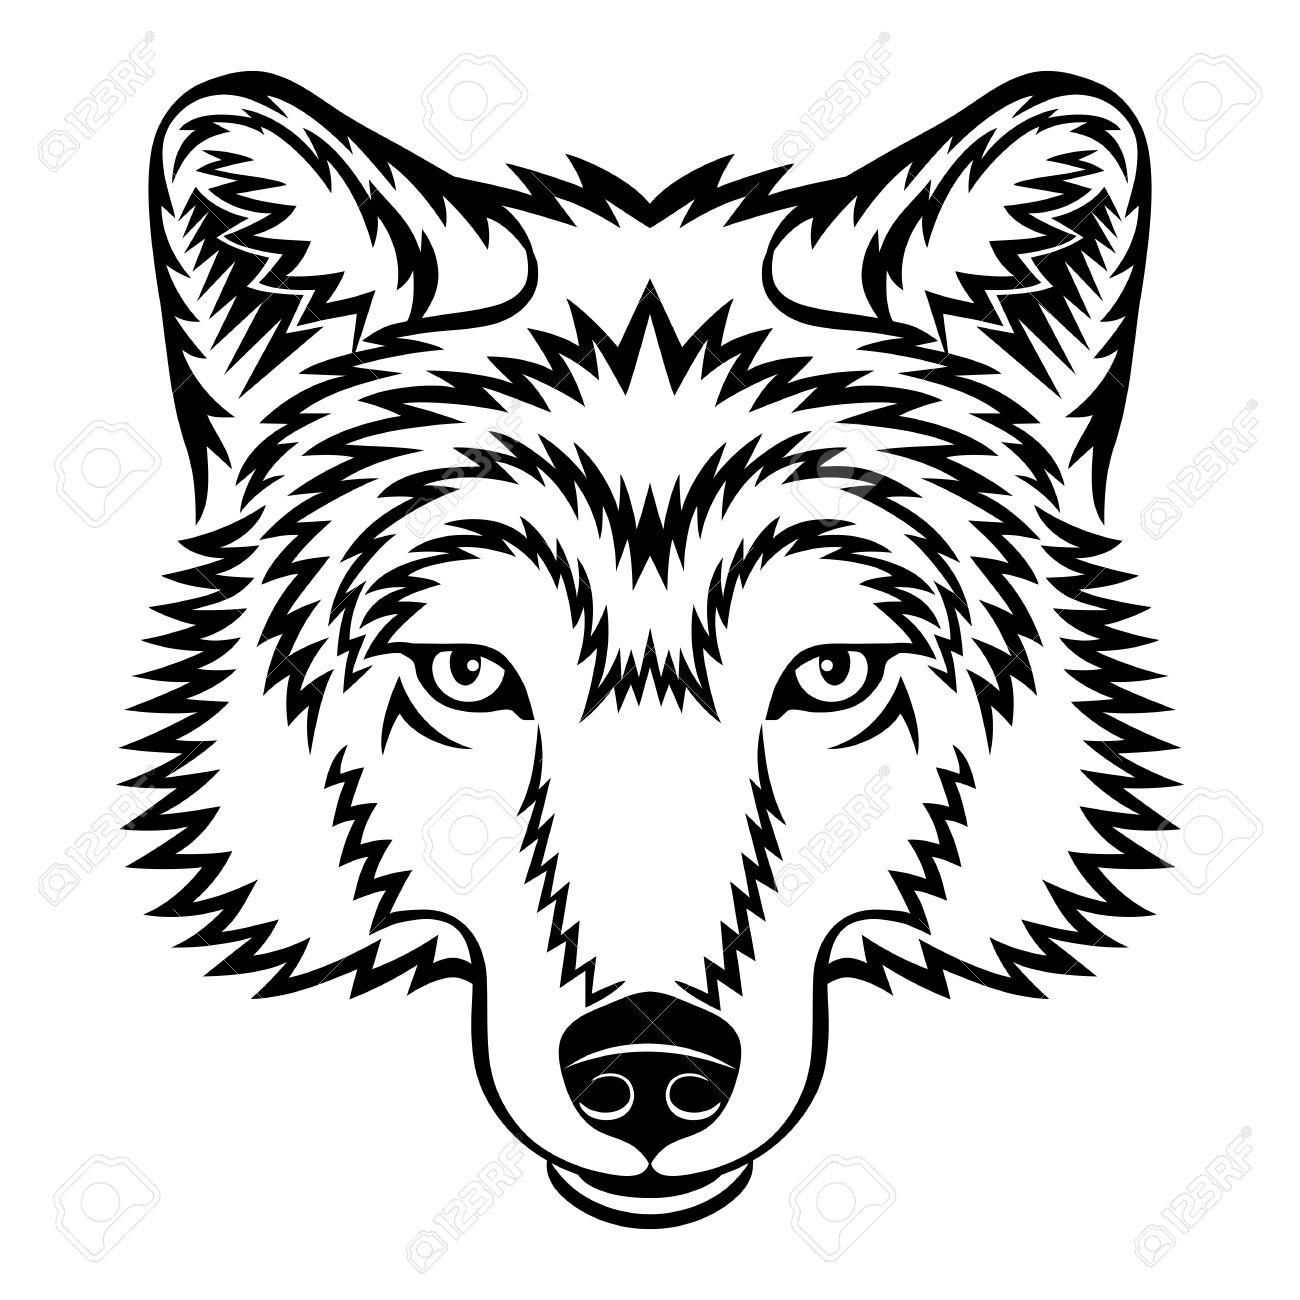 wolf head: A Wolf head in .